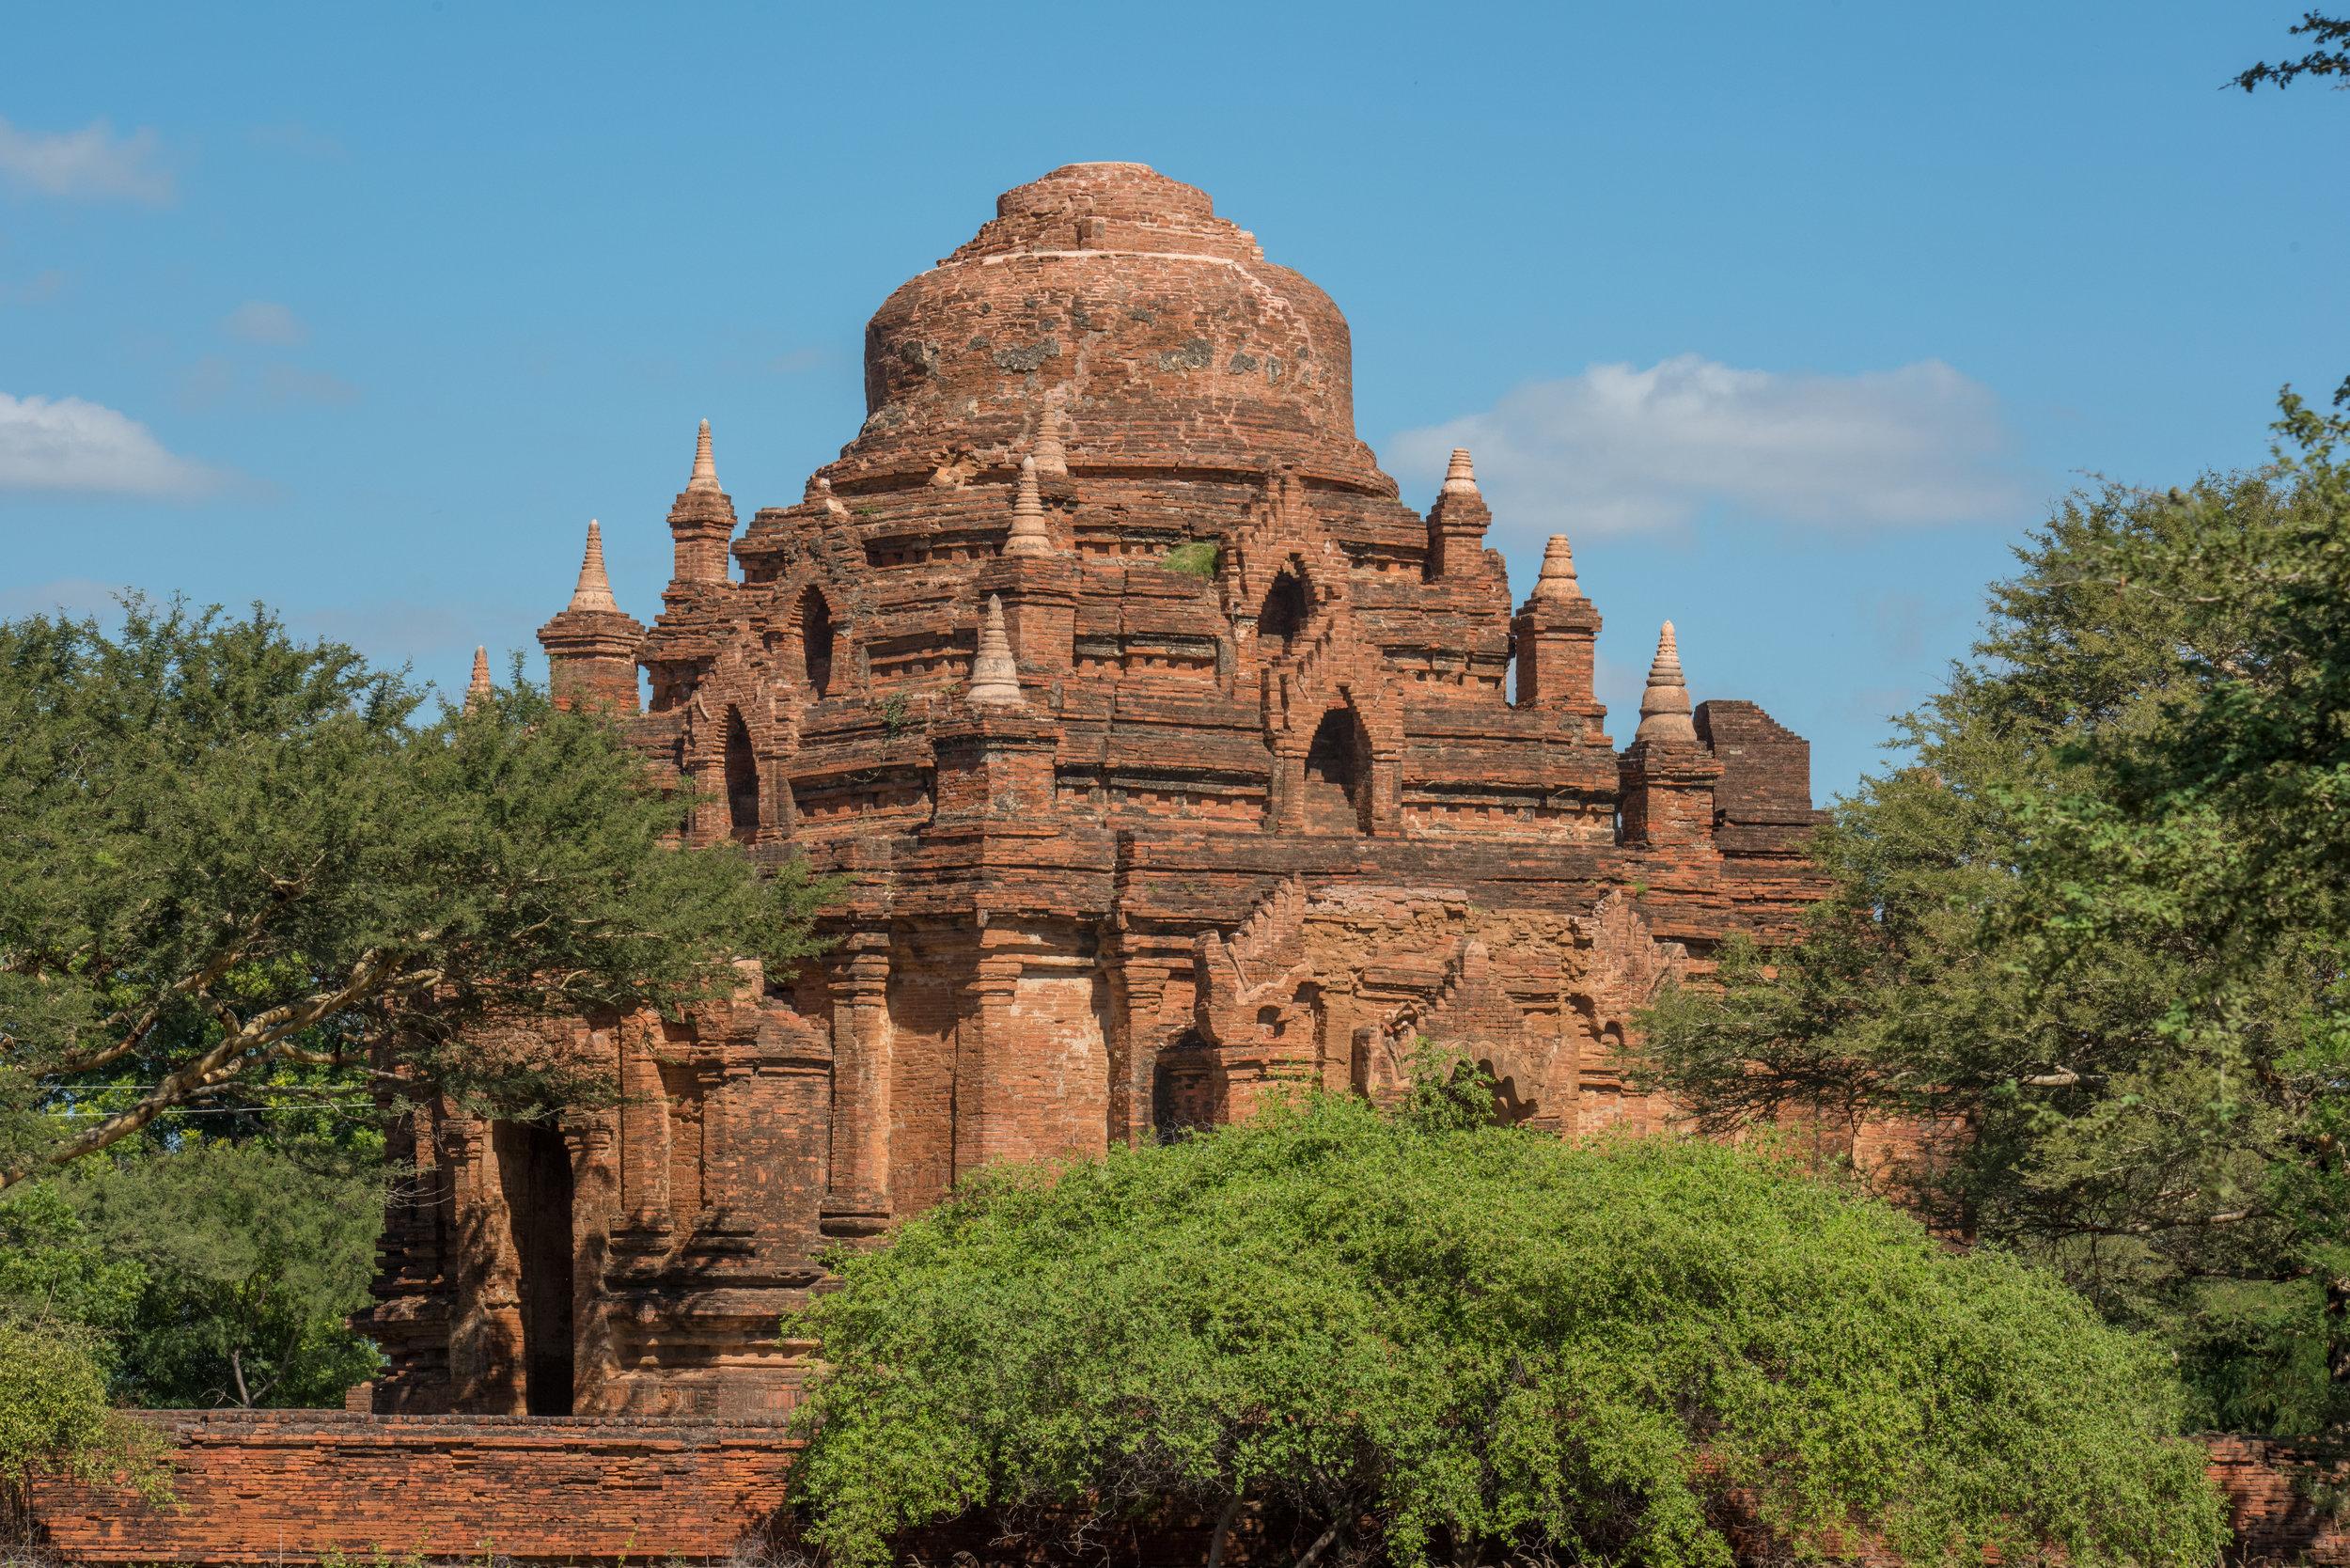 Temple, Khay Min Ga complex, Bagan, Myanmar